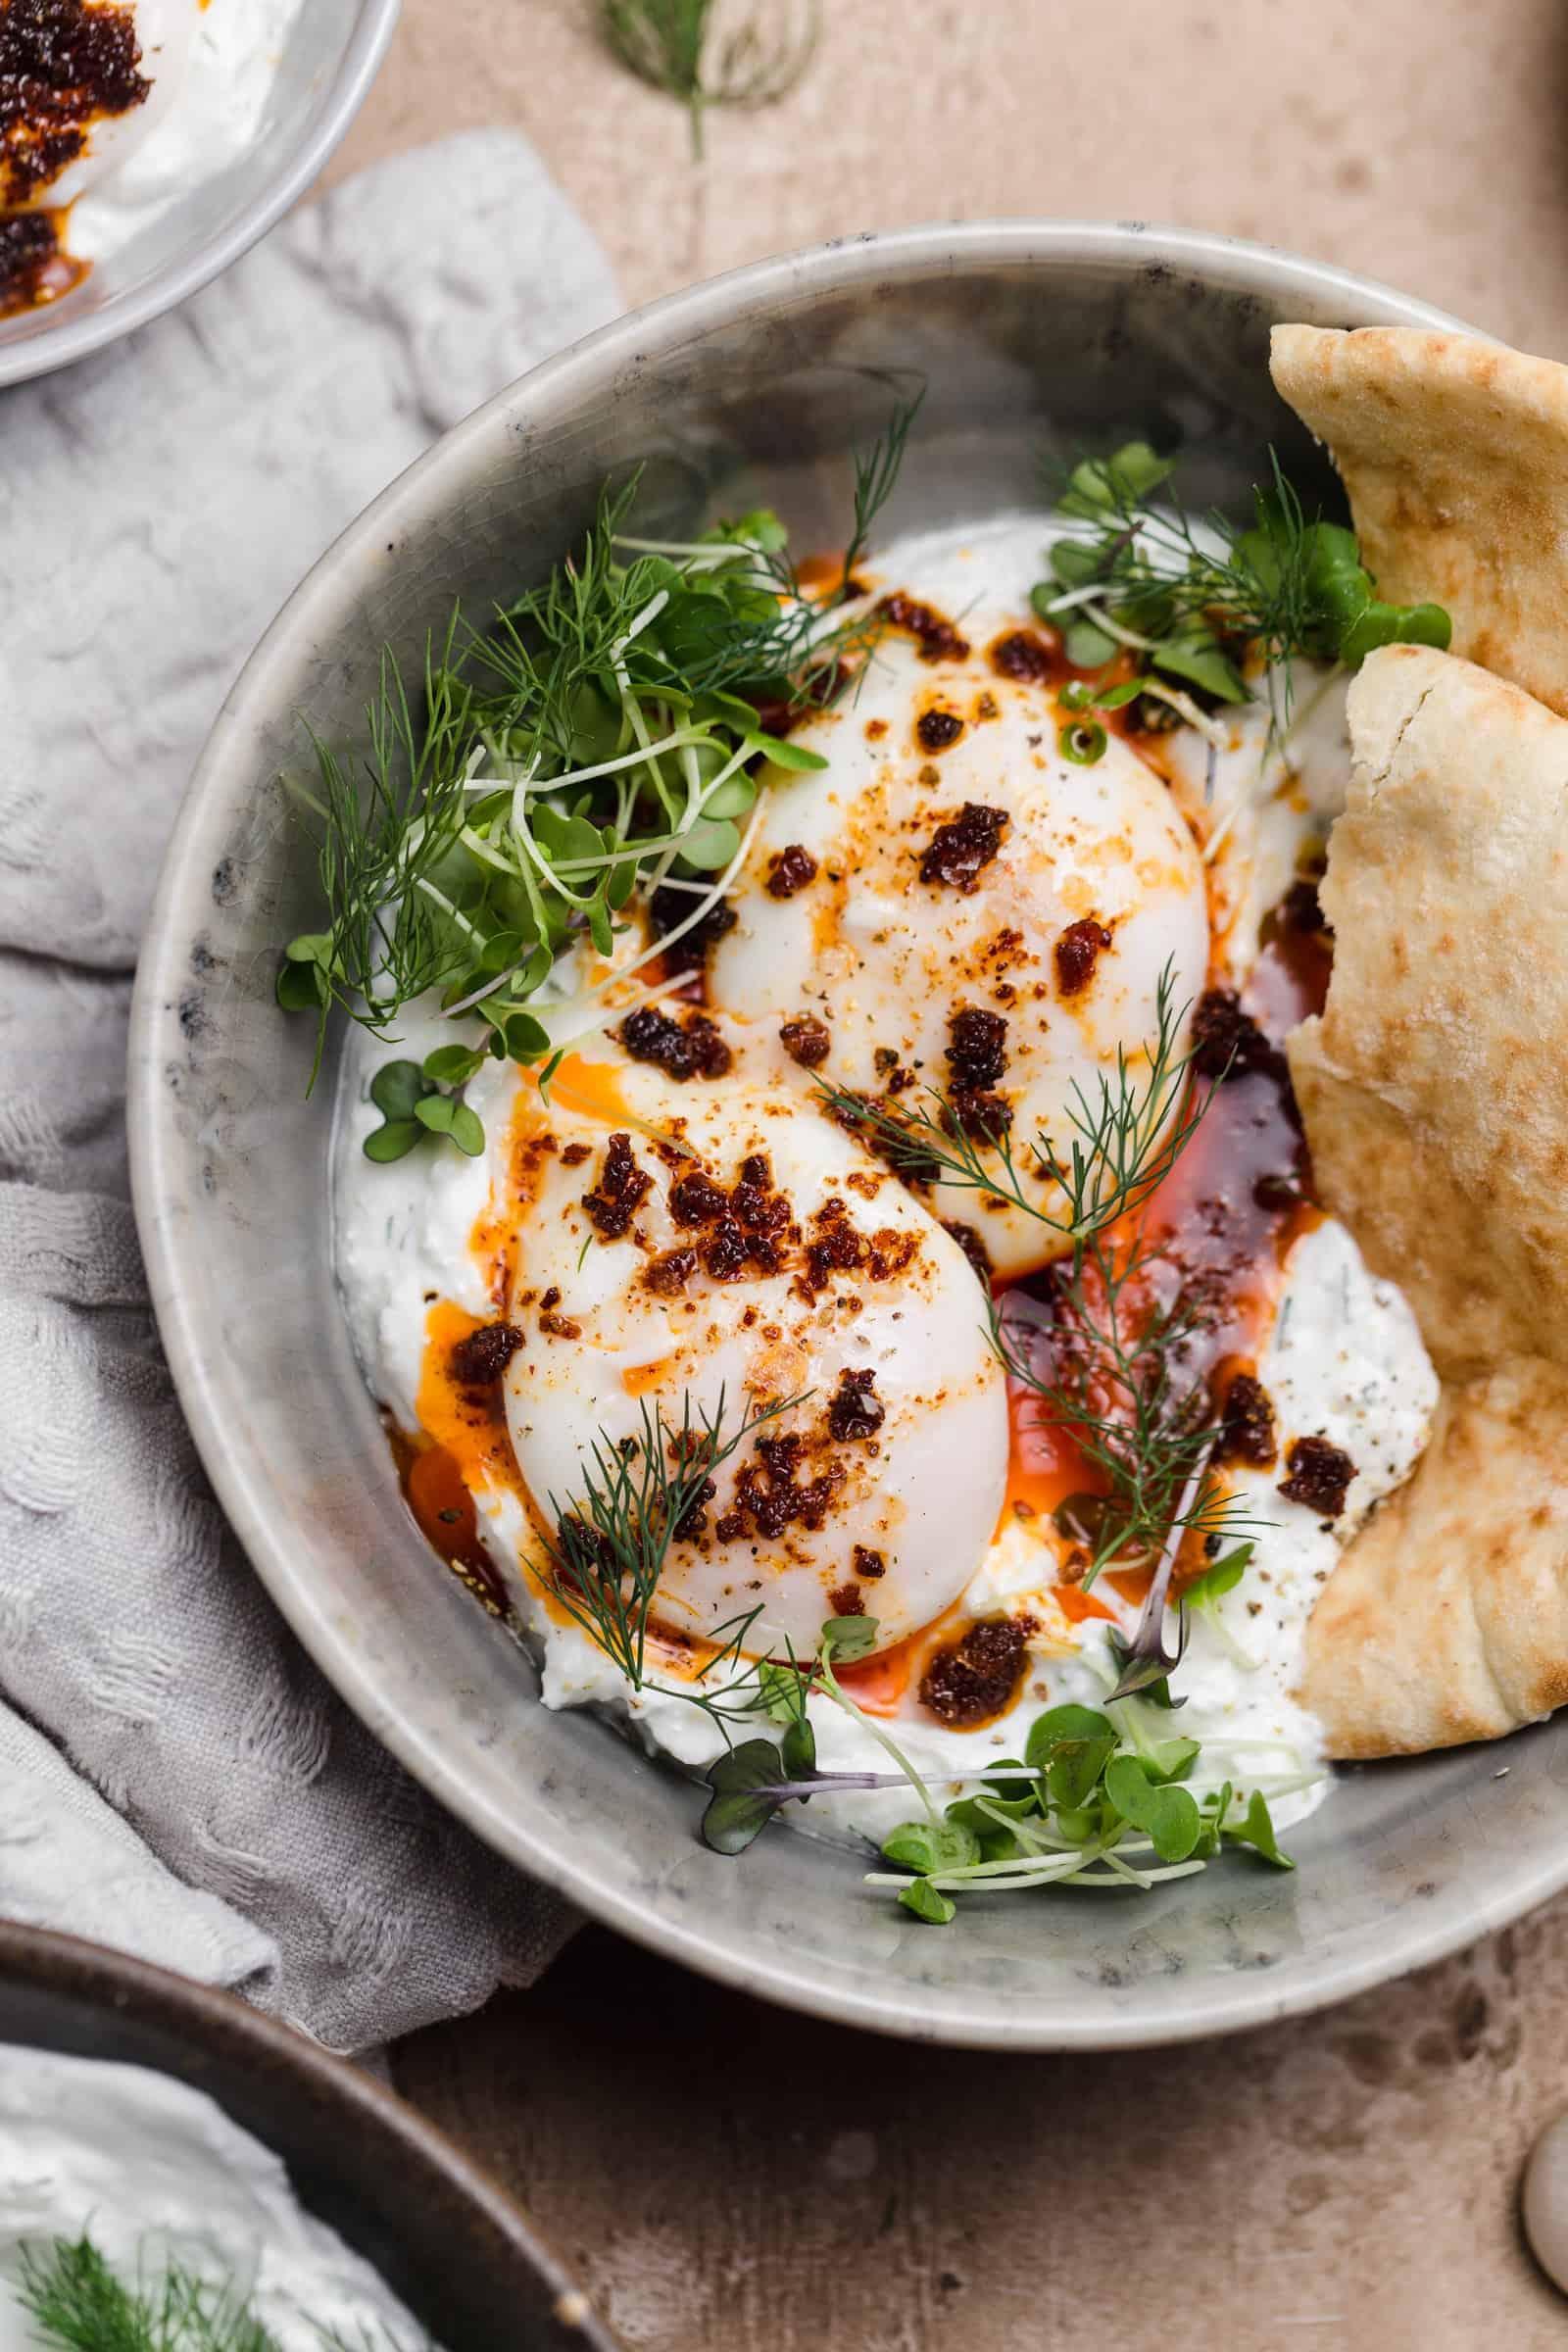 poached eggs with n'duja on top of herbed yogurt